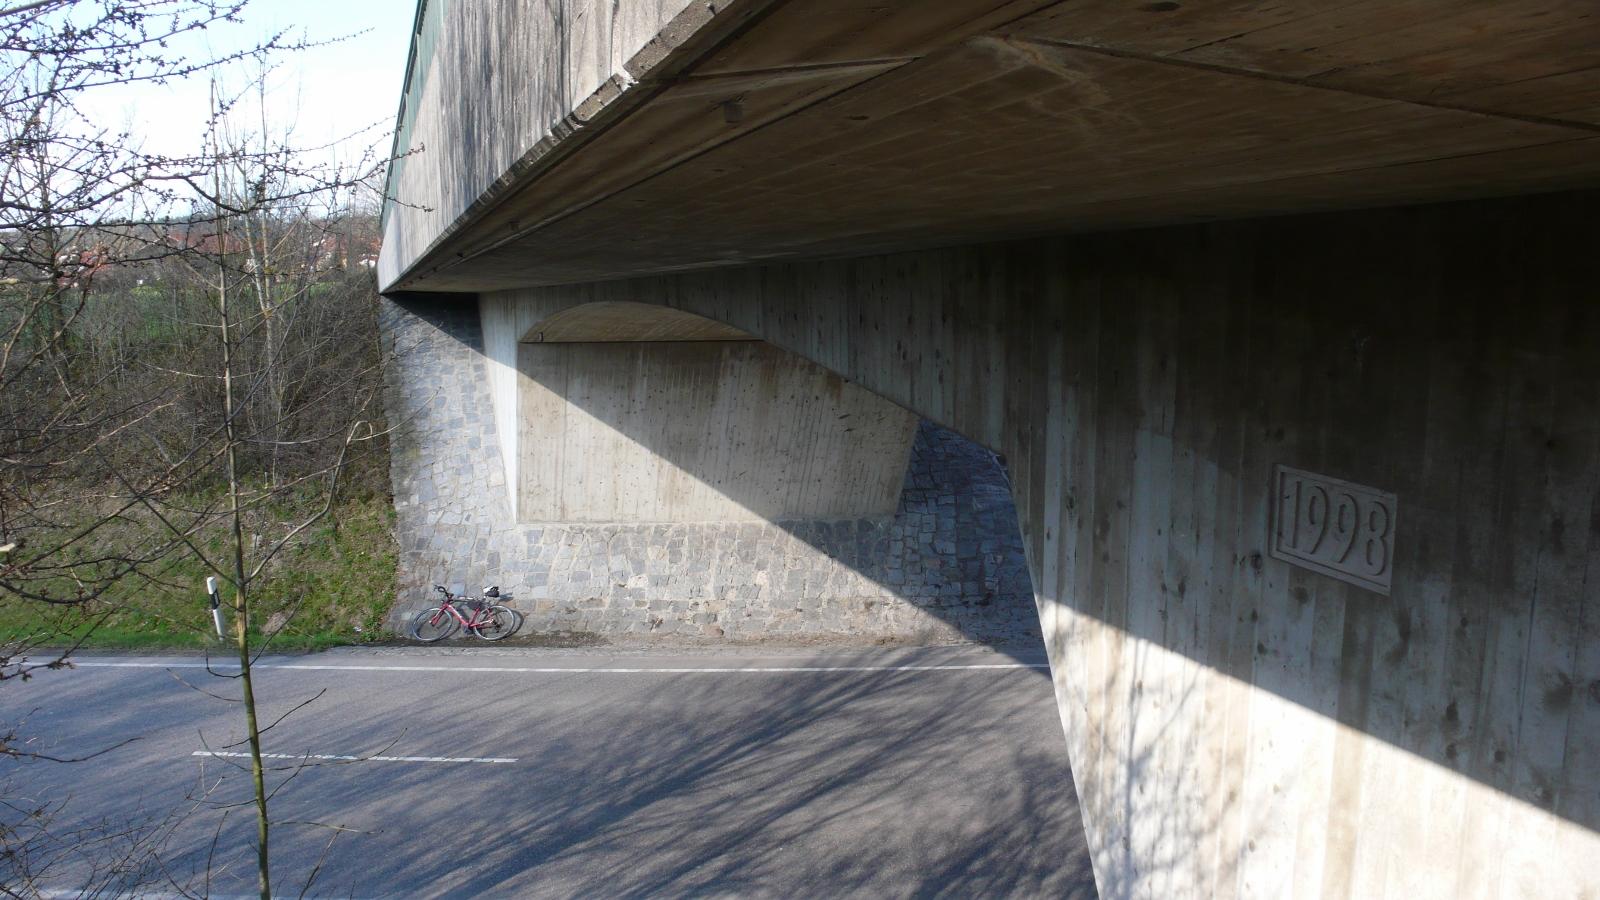 Bauwerksprüfung gem DIN 1076 (3)